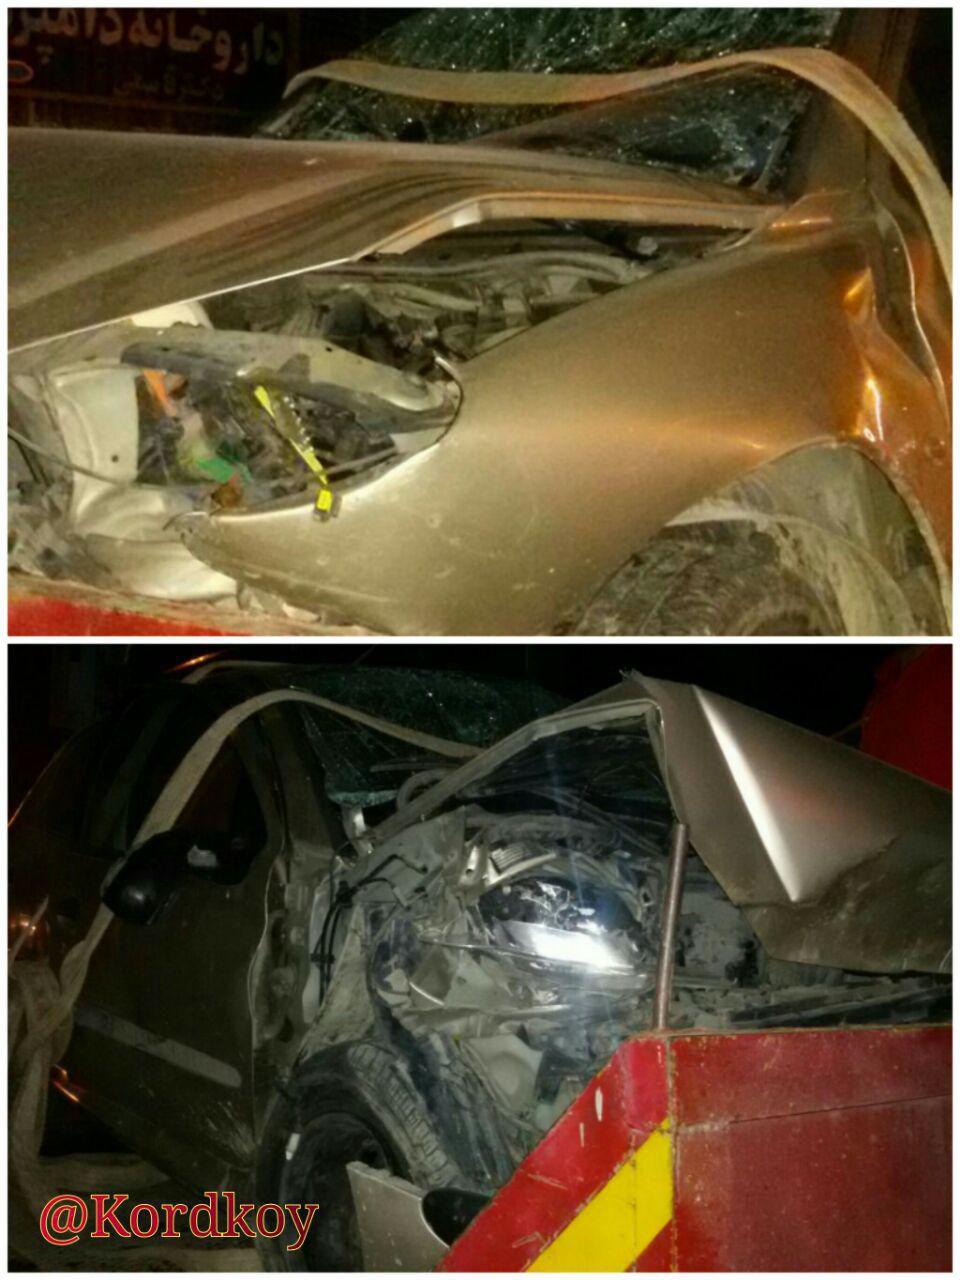 تصادف 206 در کردکوی